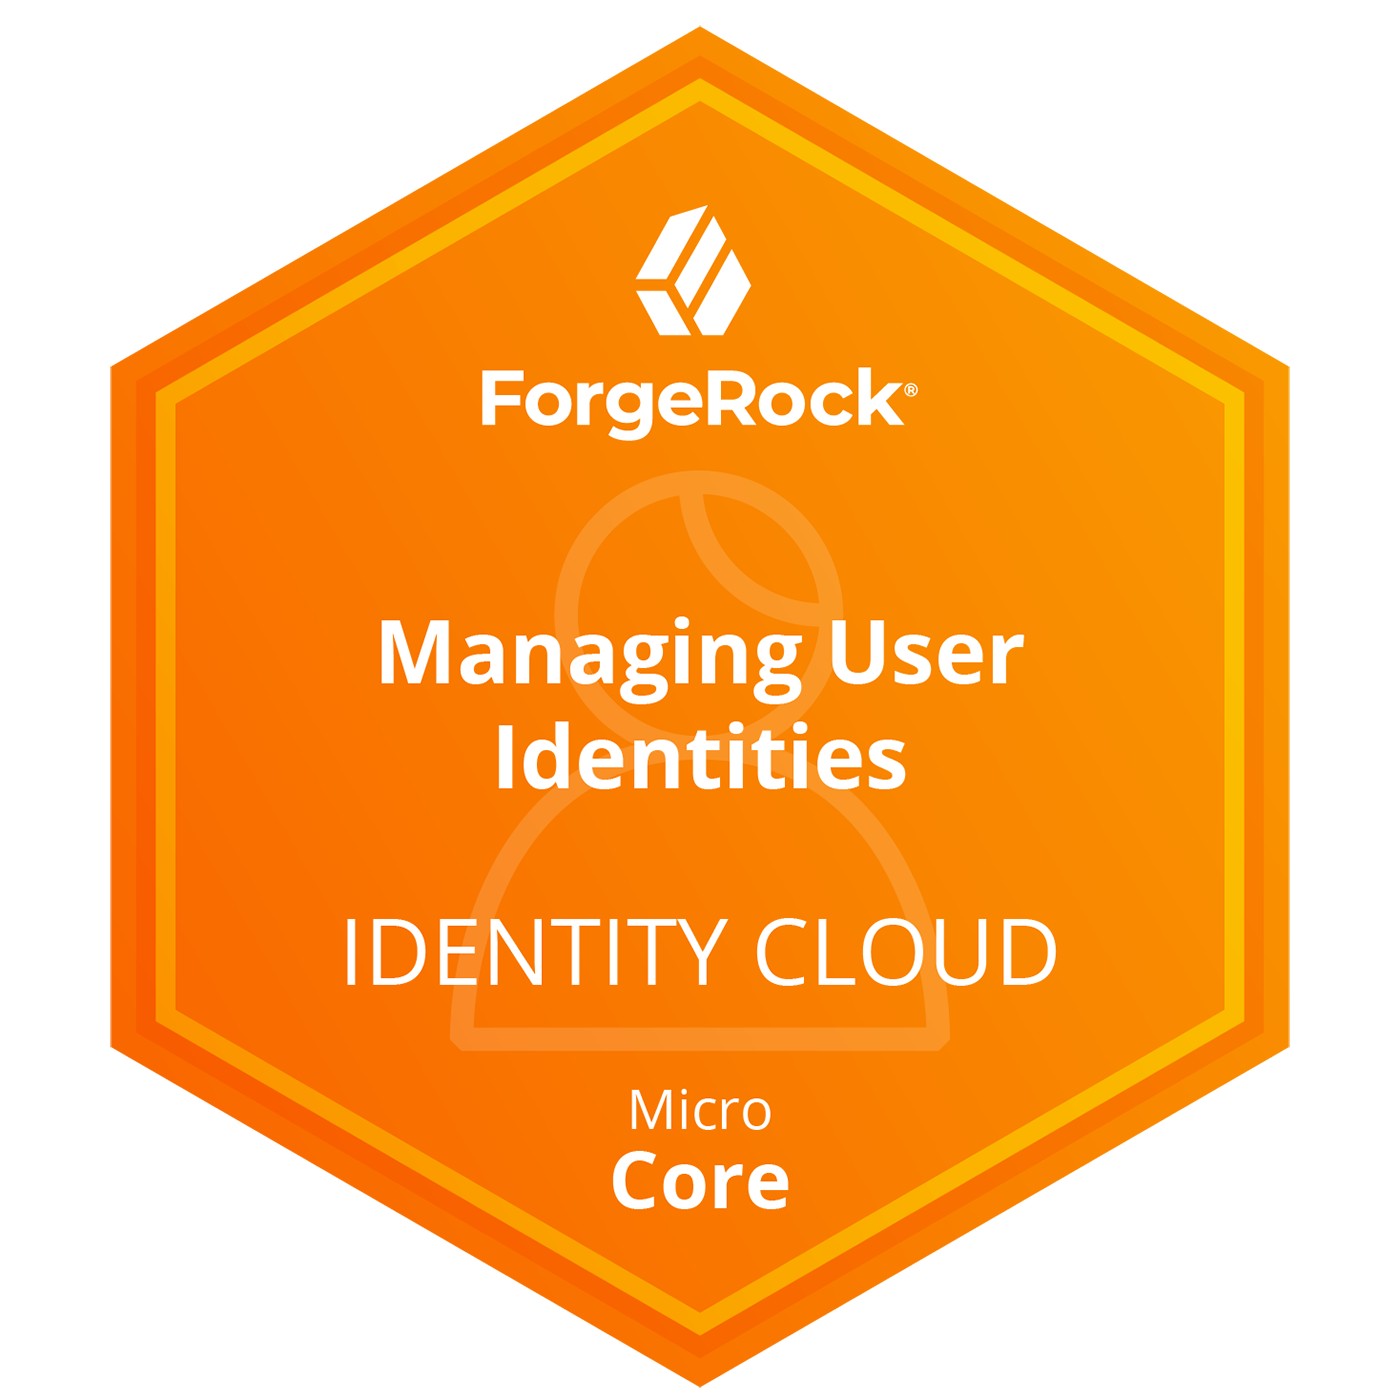 ForgeRock Identity Cloud Micro Core Skills - Managing User Identities